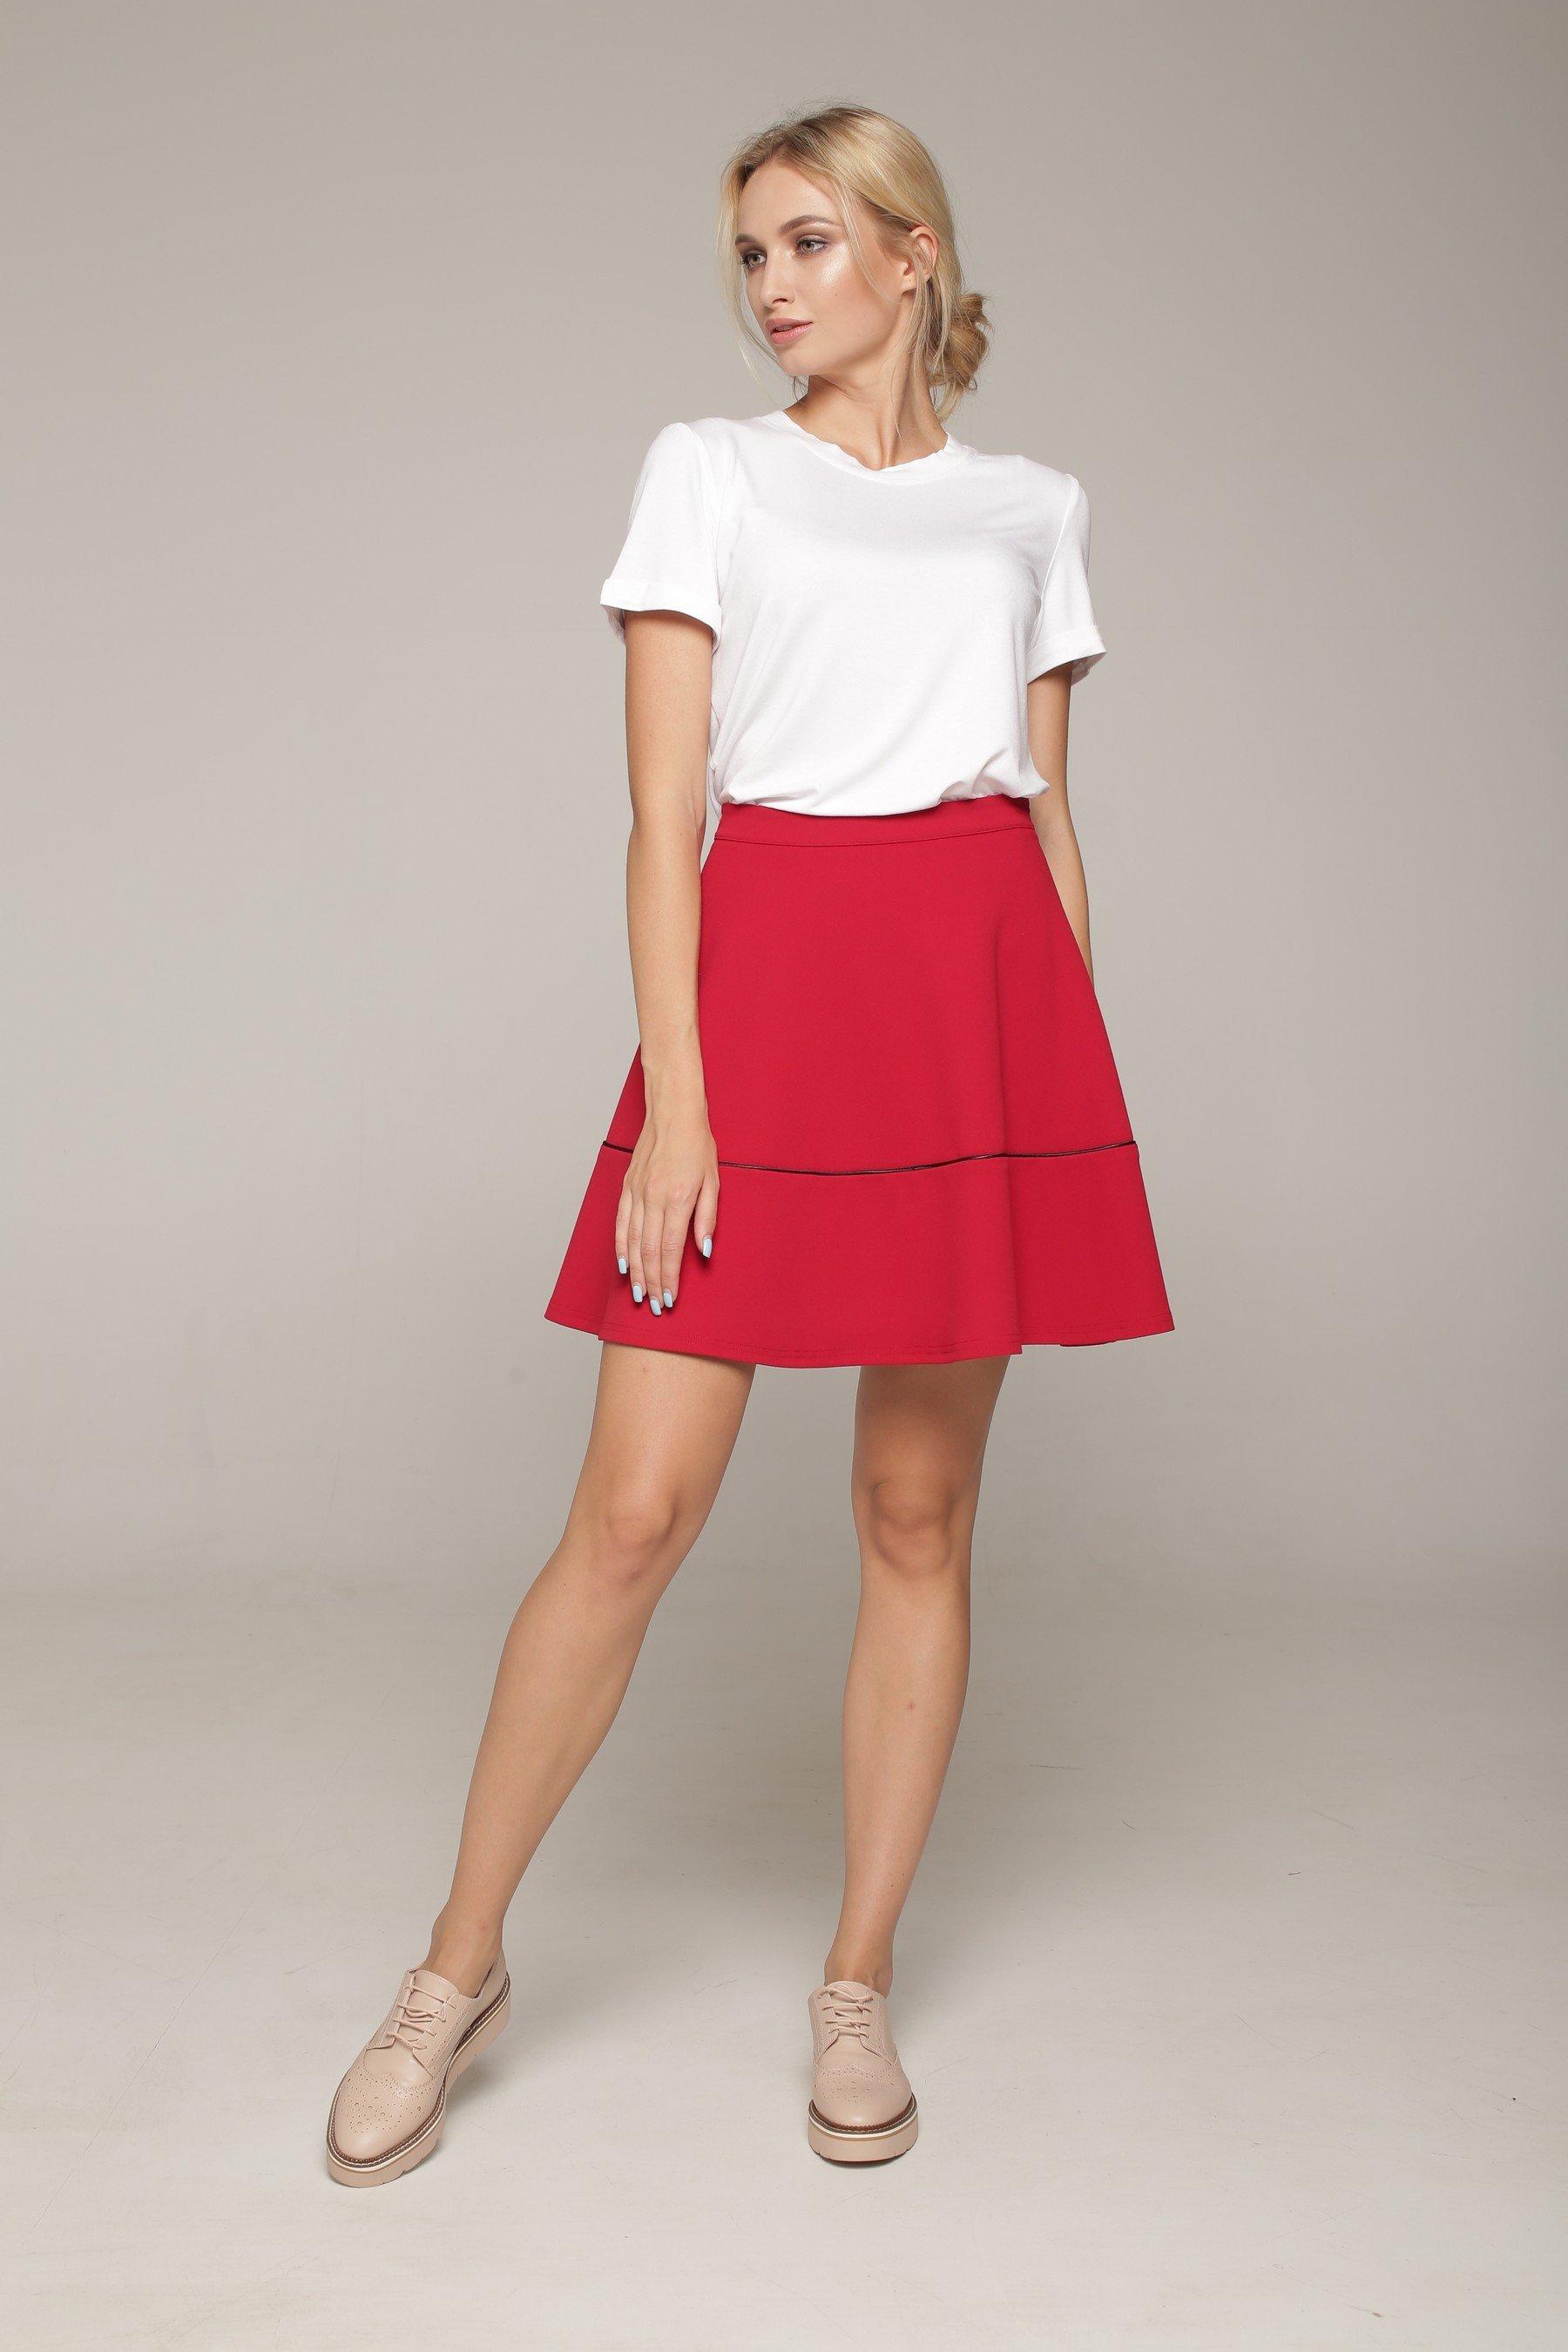 Оптом юбки